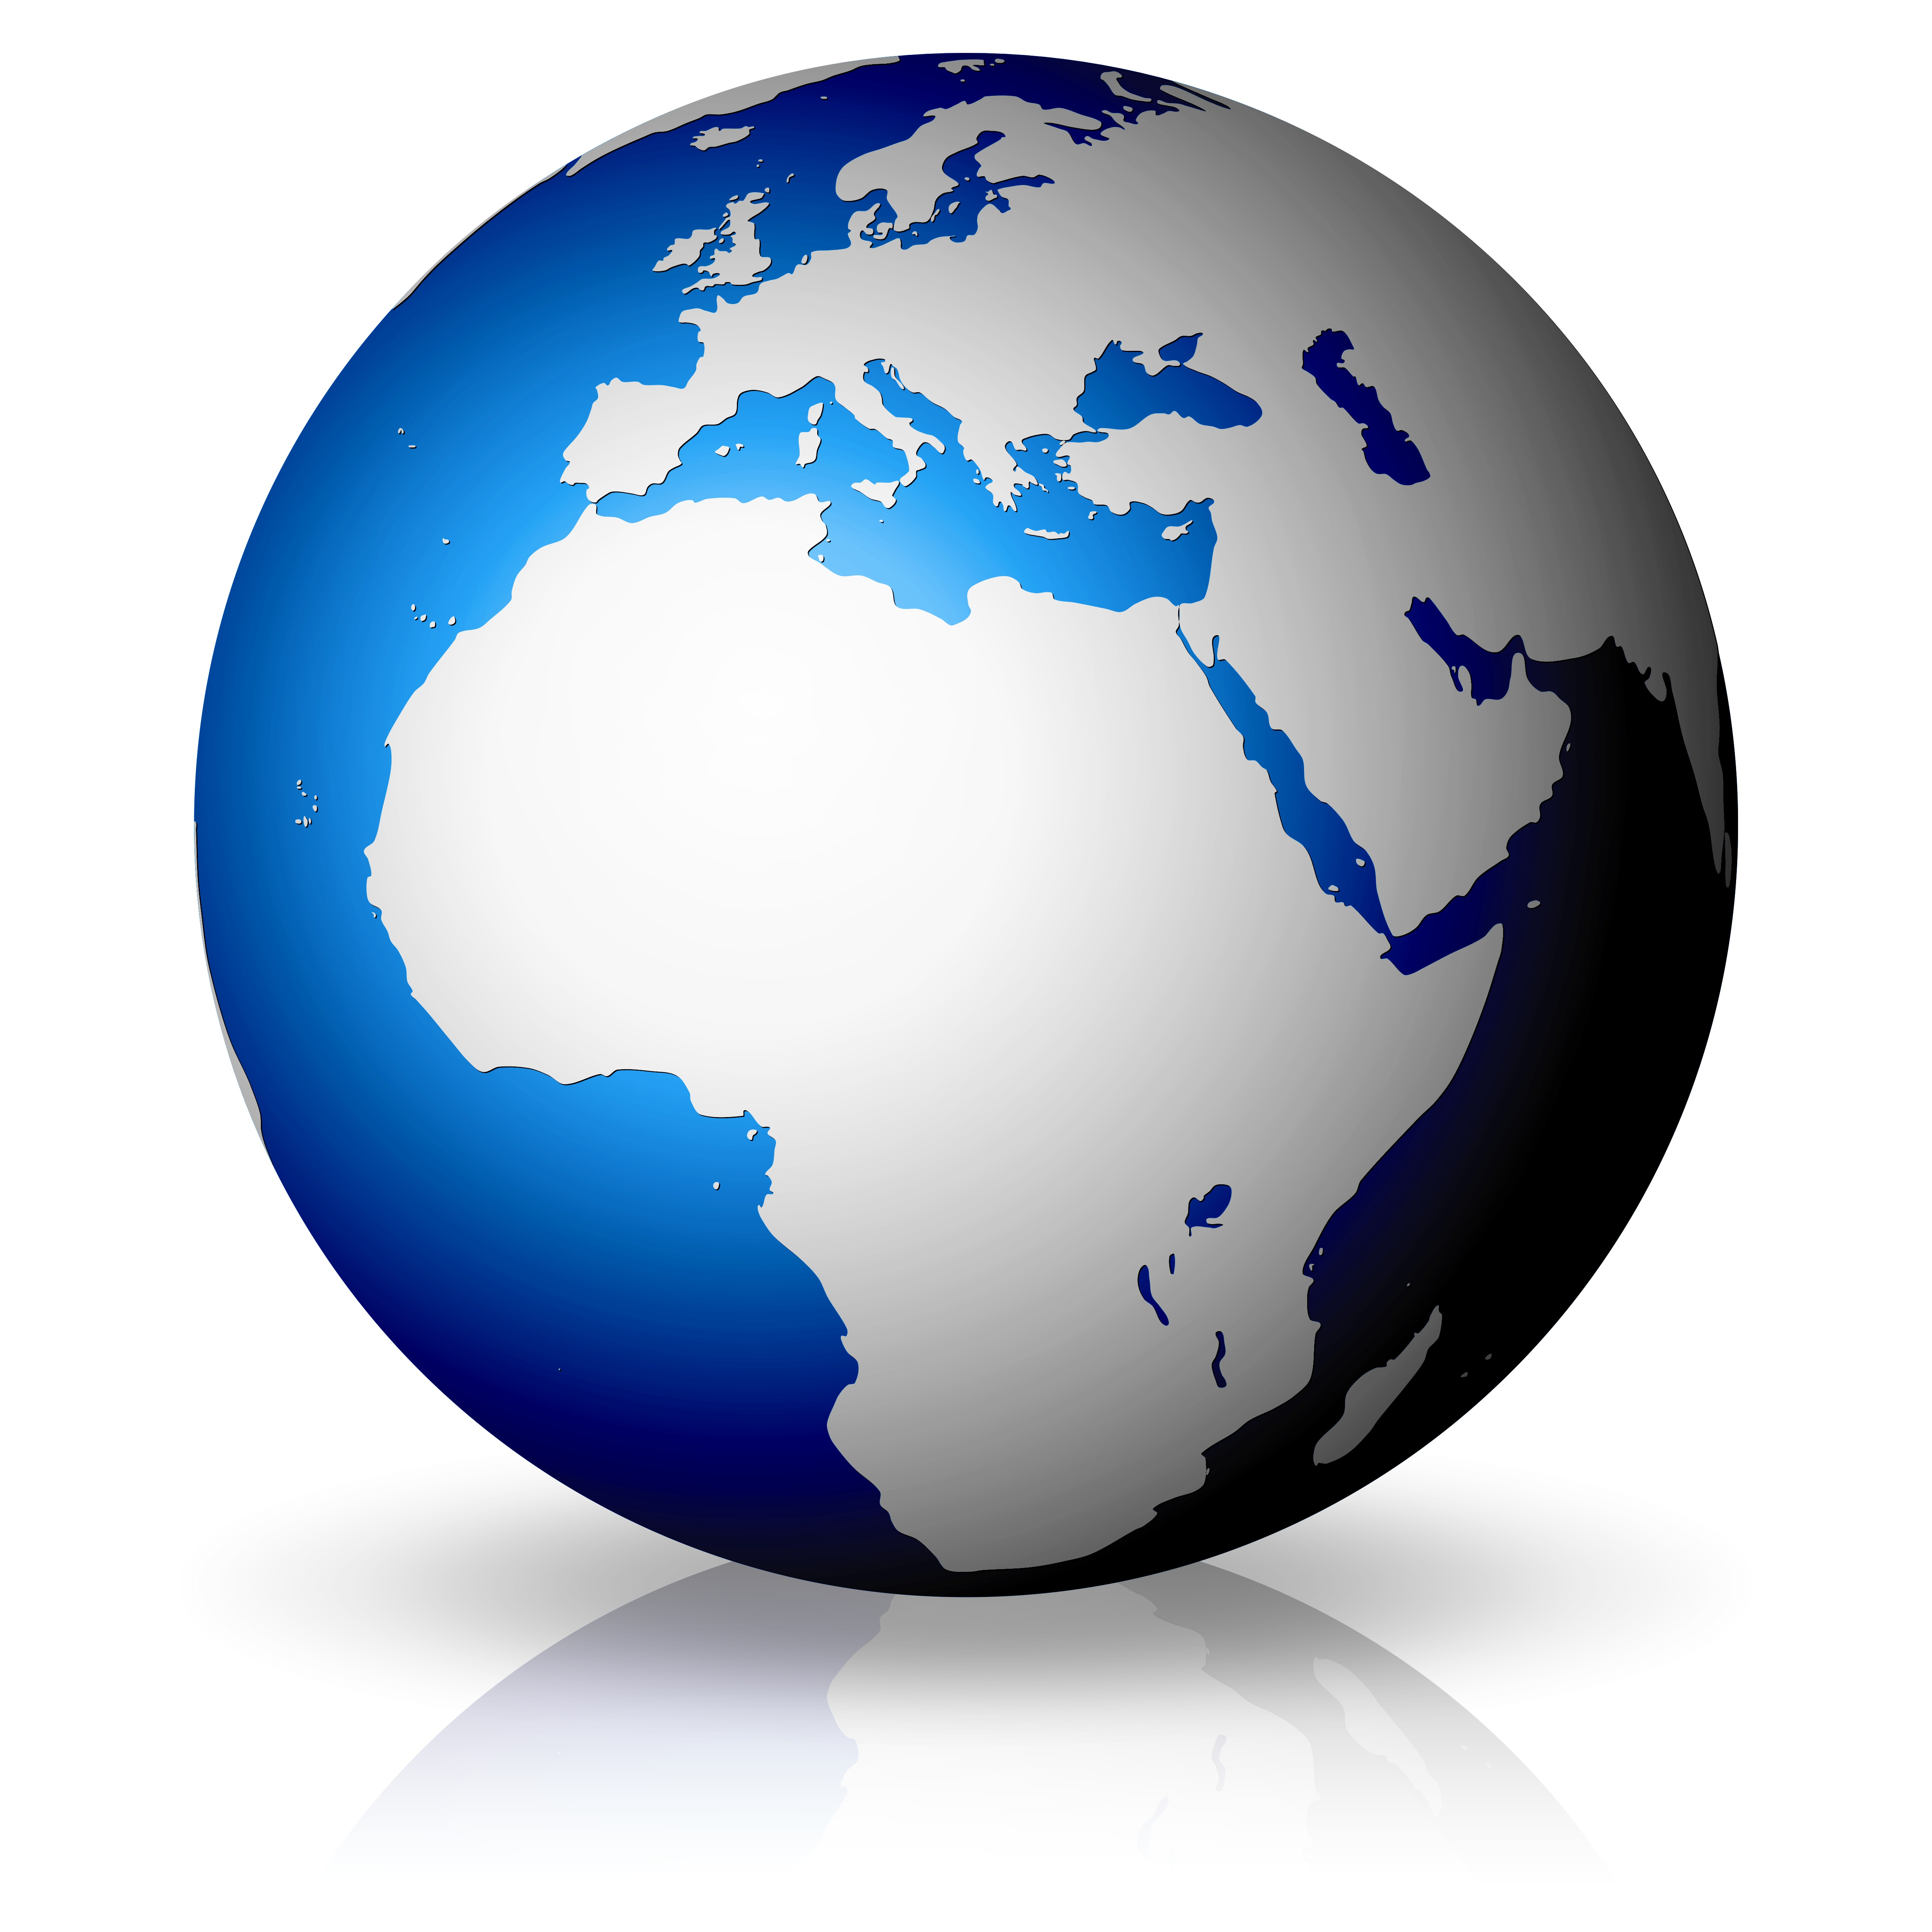 Globe Png image #39541